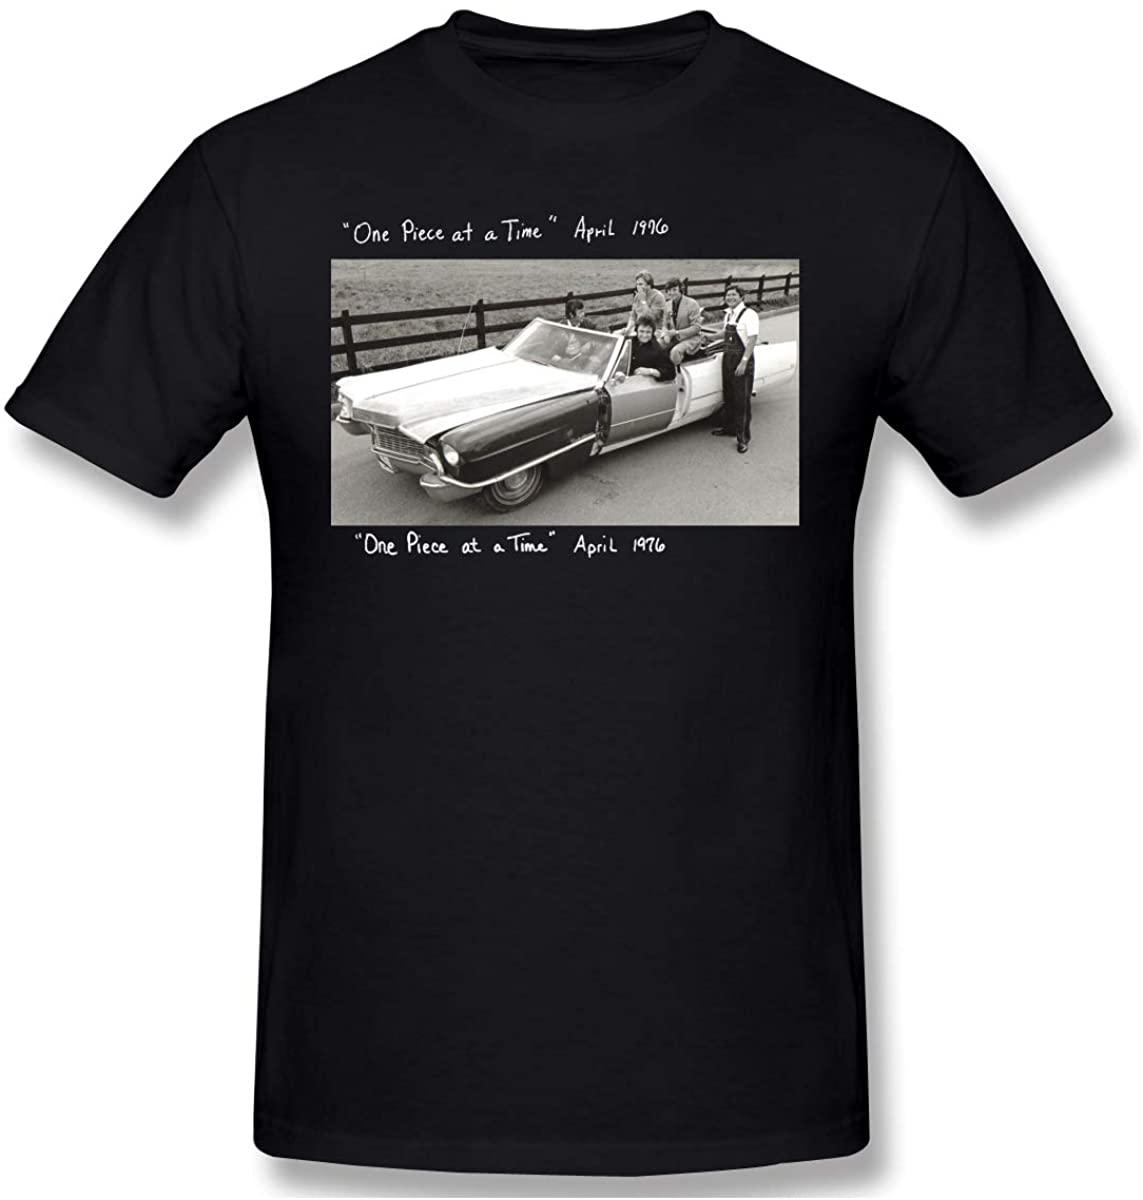 Bob L Barrera Johnny Cash One Piece at A Time Leisure Mans Short-Sleeve T-Shirt XXL Black